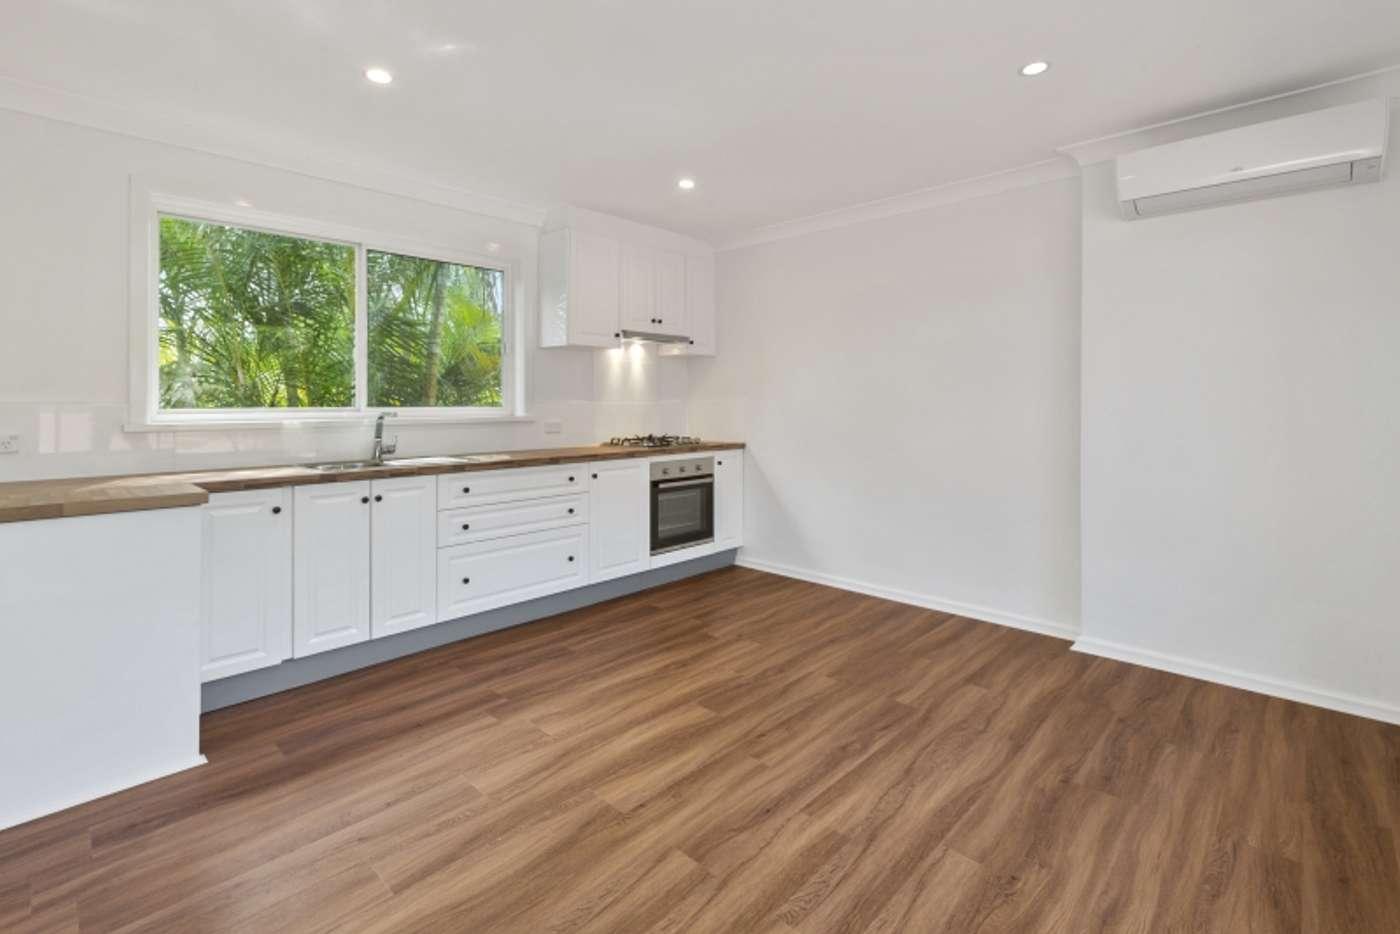 Main view of Homely flat listing, 75c Lantana Avenue, Collaroy Plateau NSW 2097